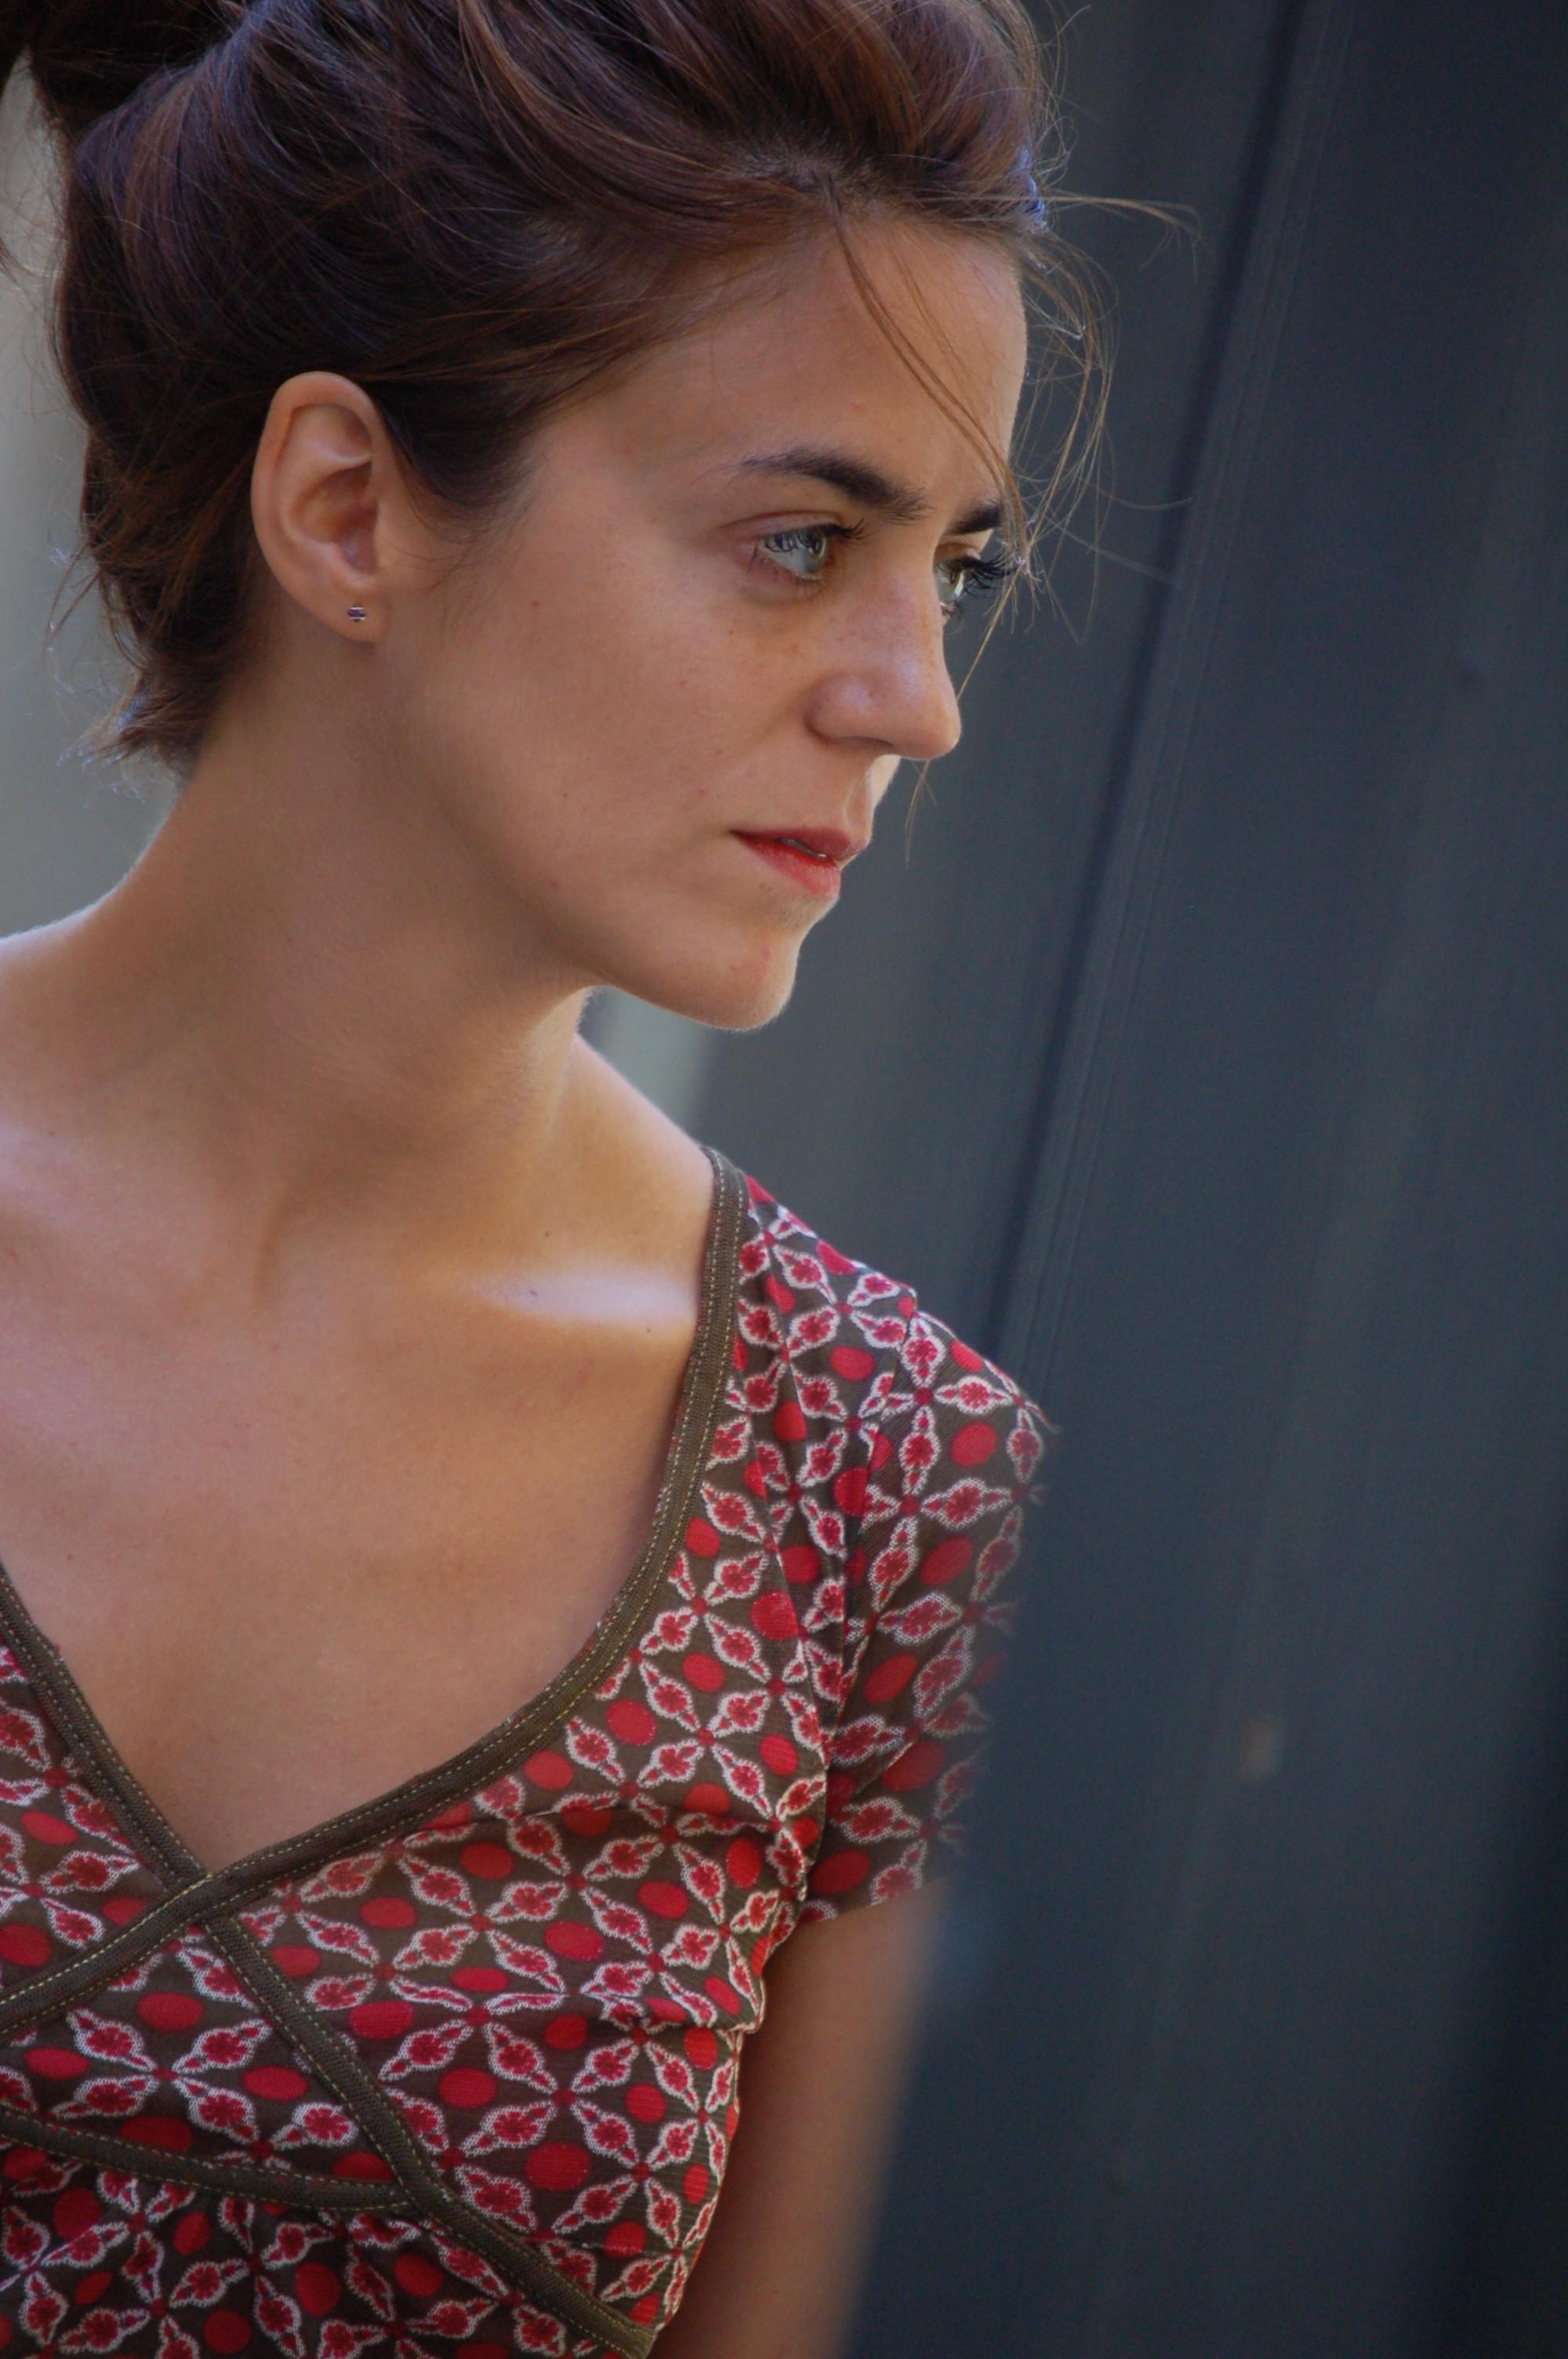 La escritora Eider Rodríguez